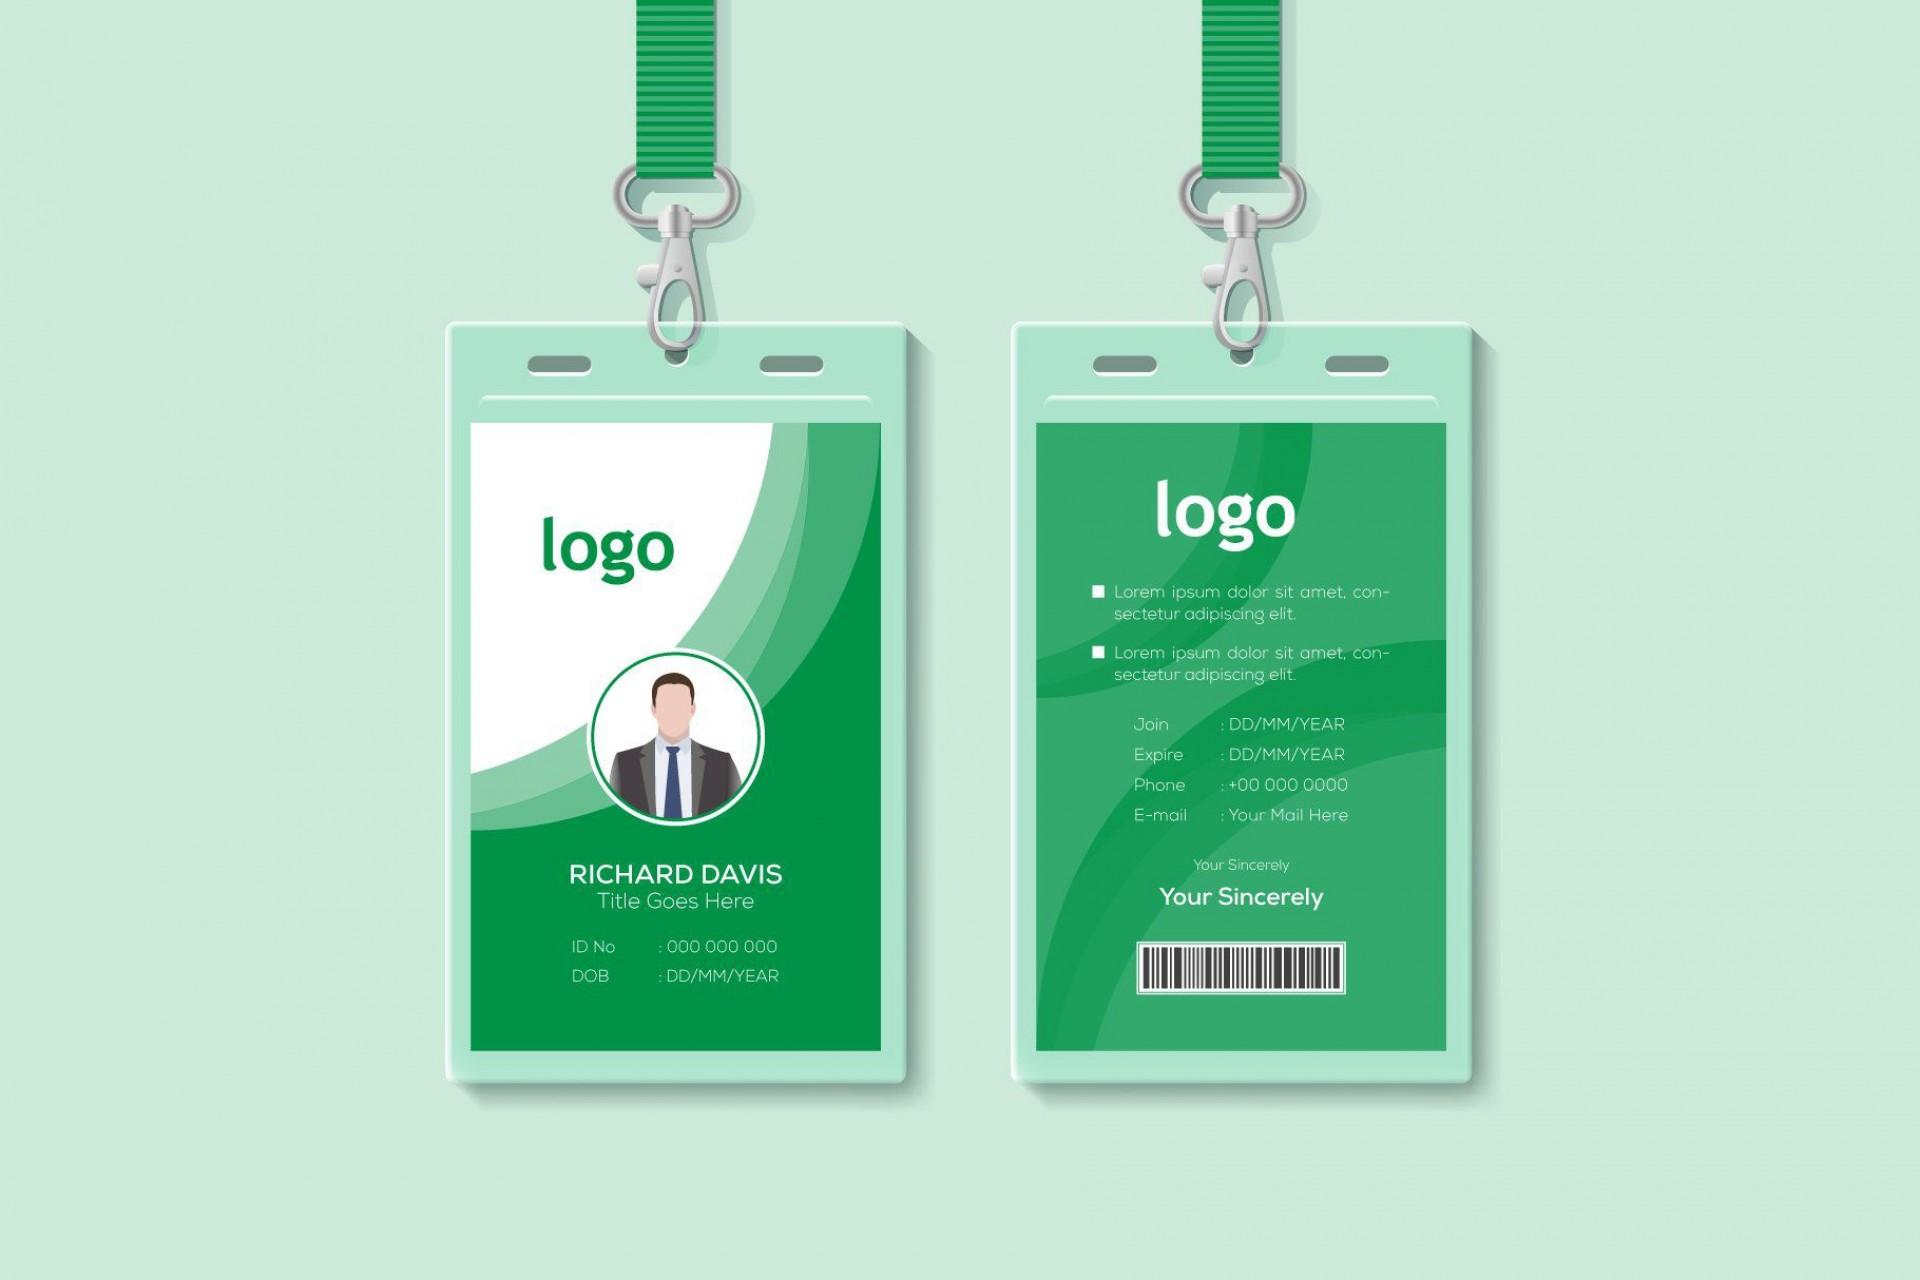 001 Unbelievable Employee Id Card Template Idea  Free Download Psd Word1920